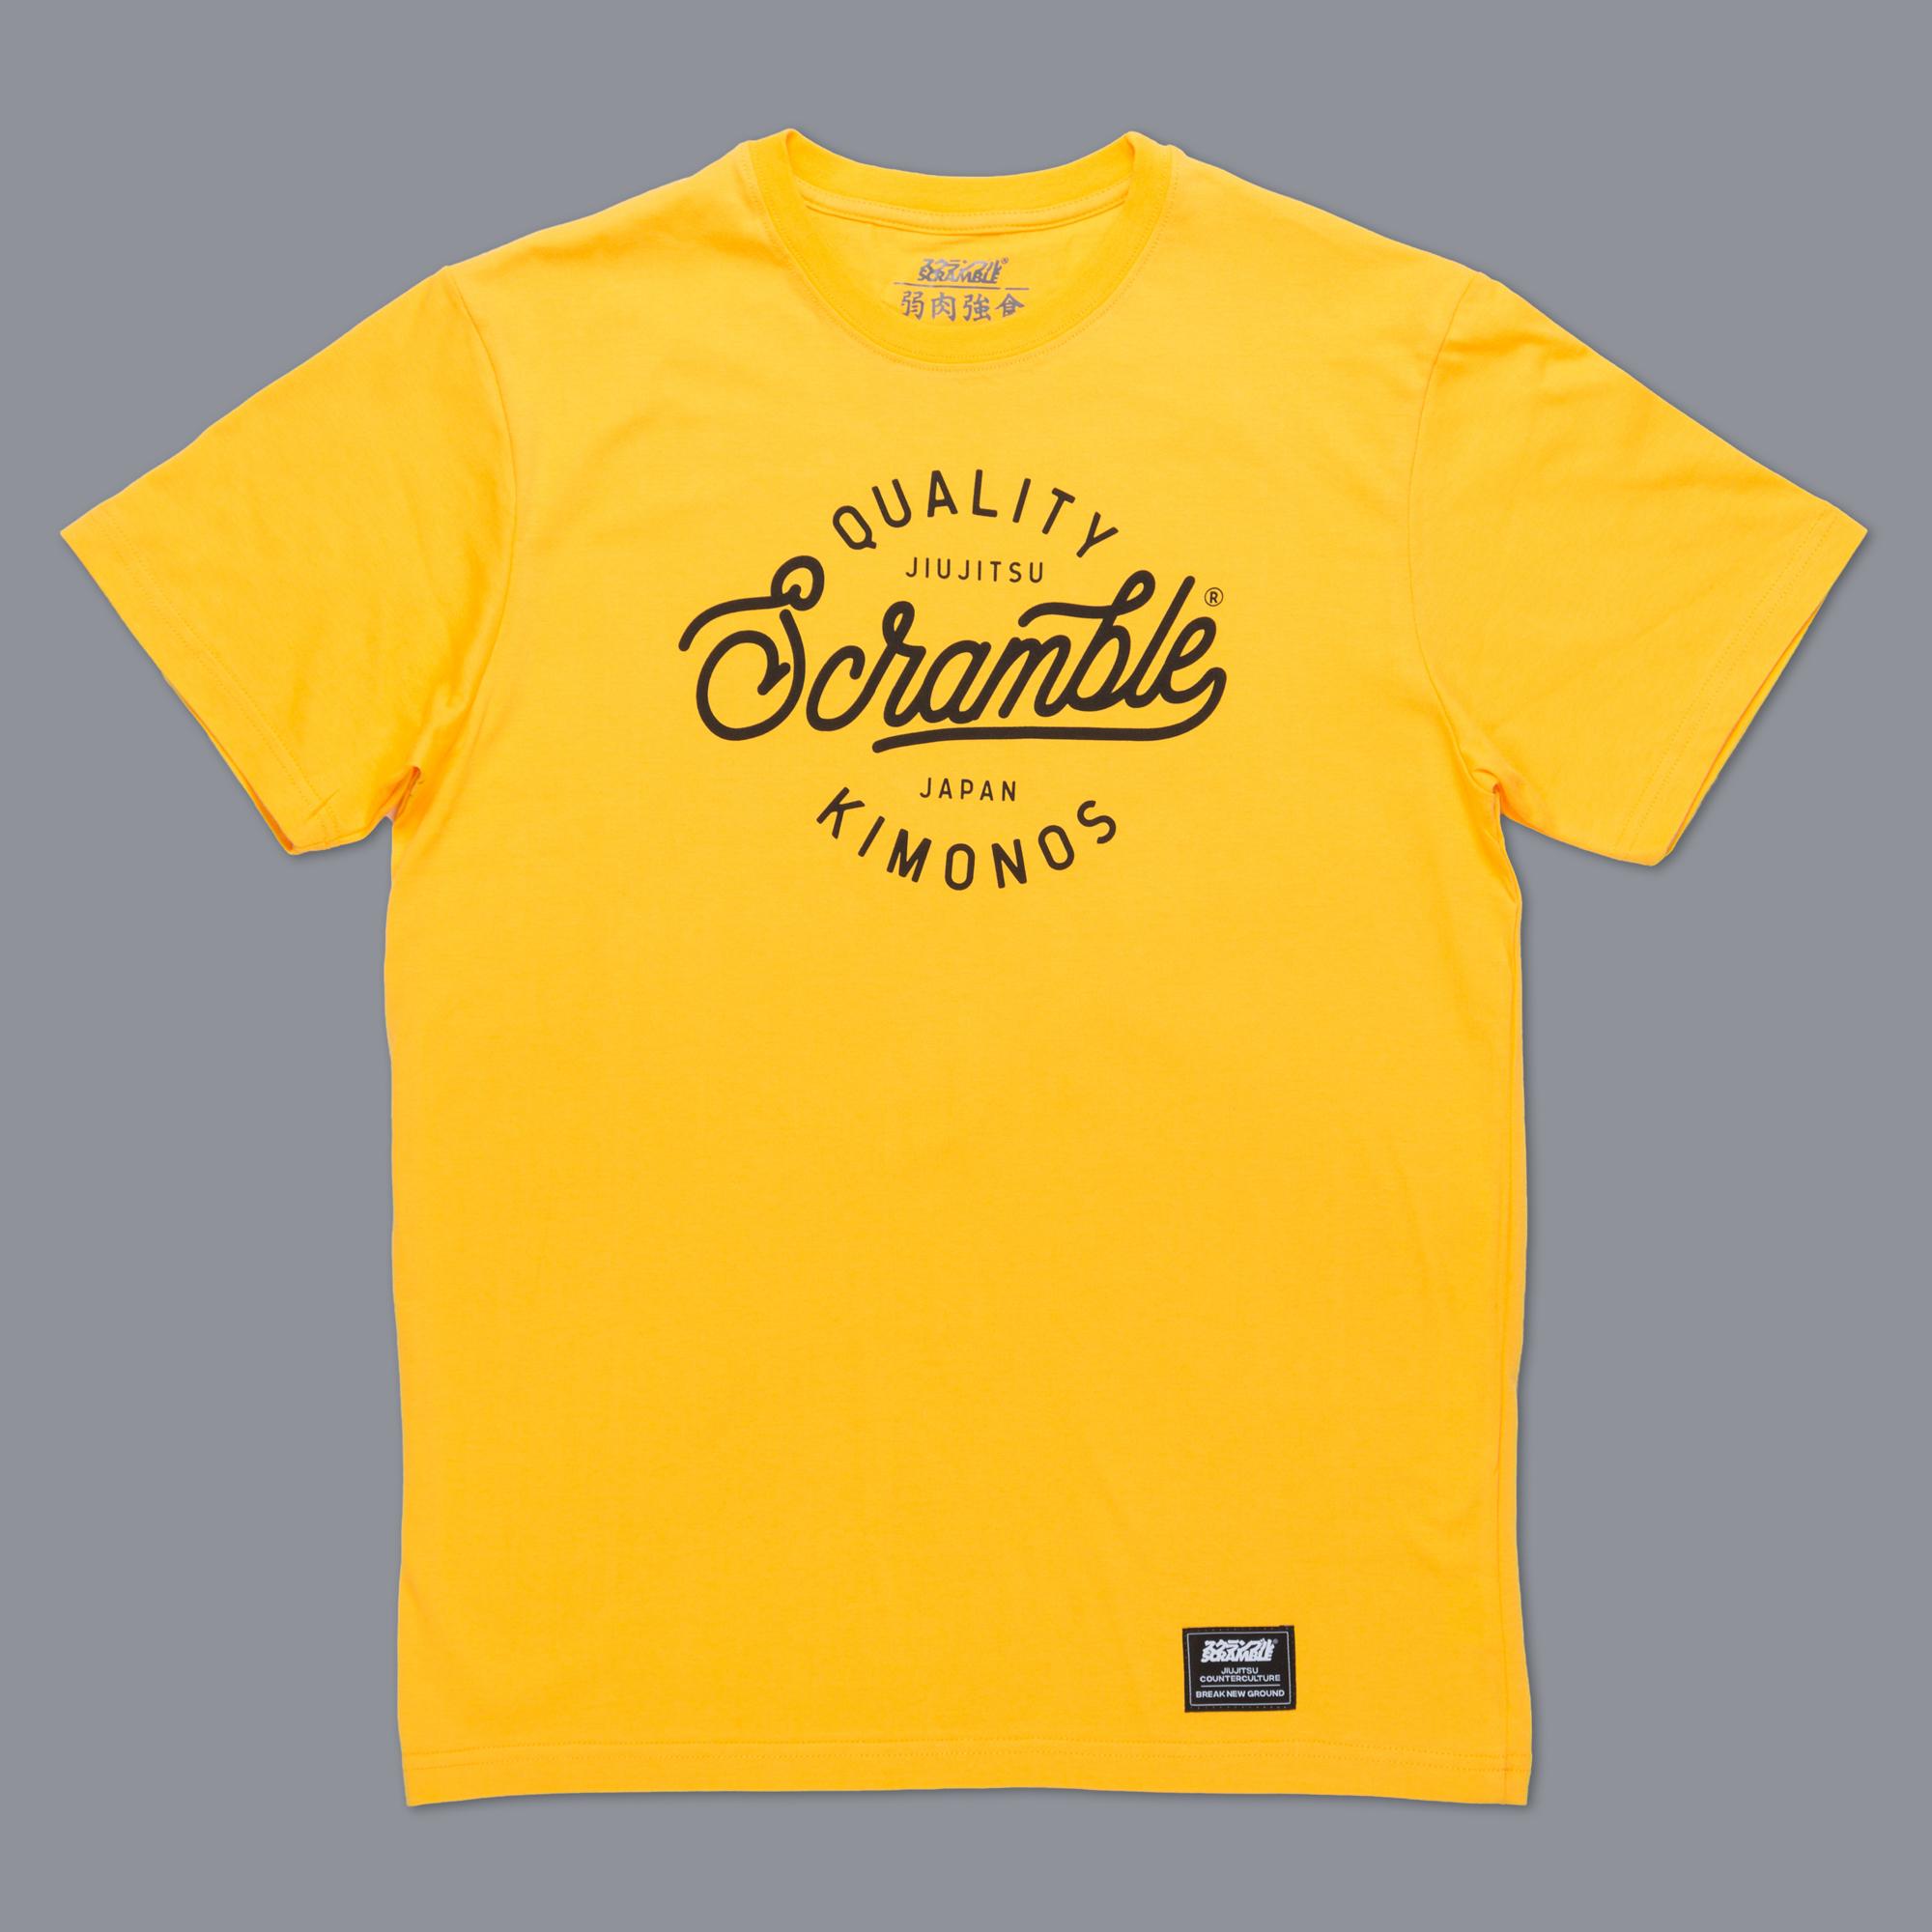 Scramble Quality Kimonos Tee - Yellow|格闘技、柔術Tシャツ